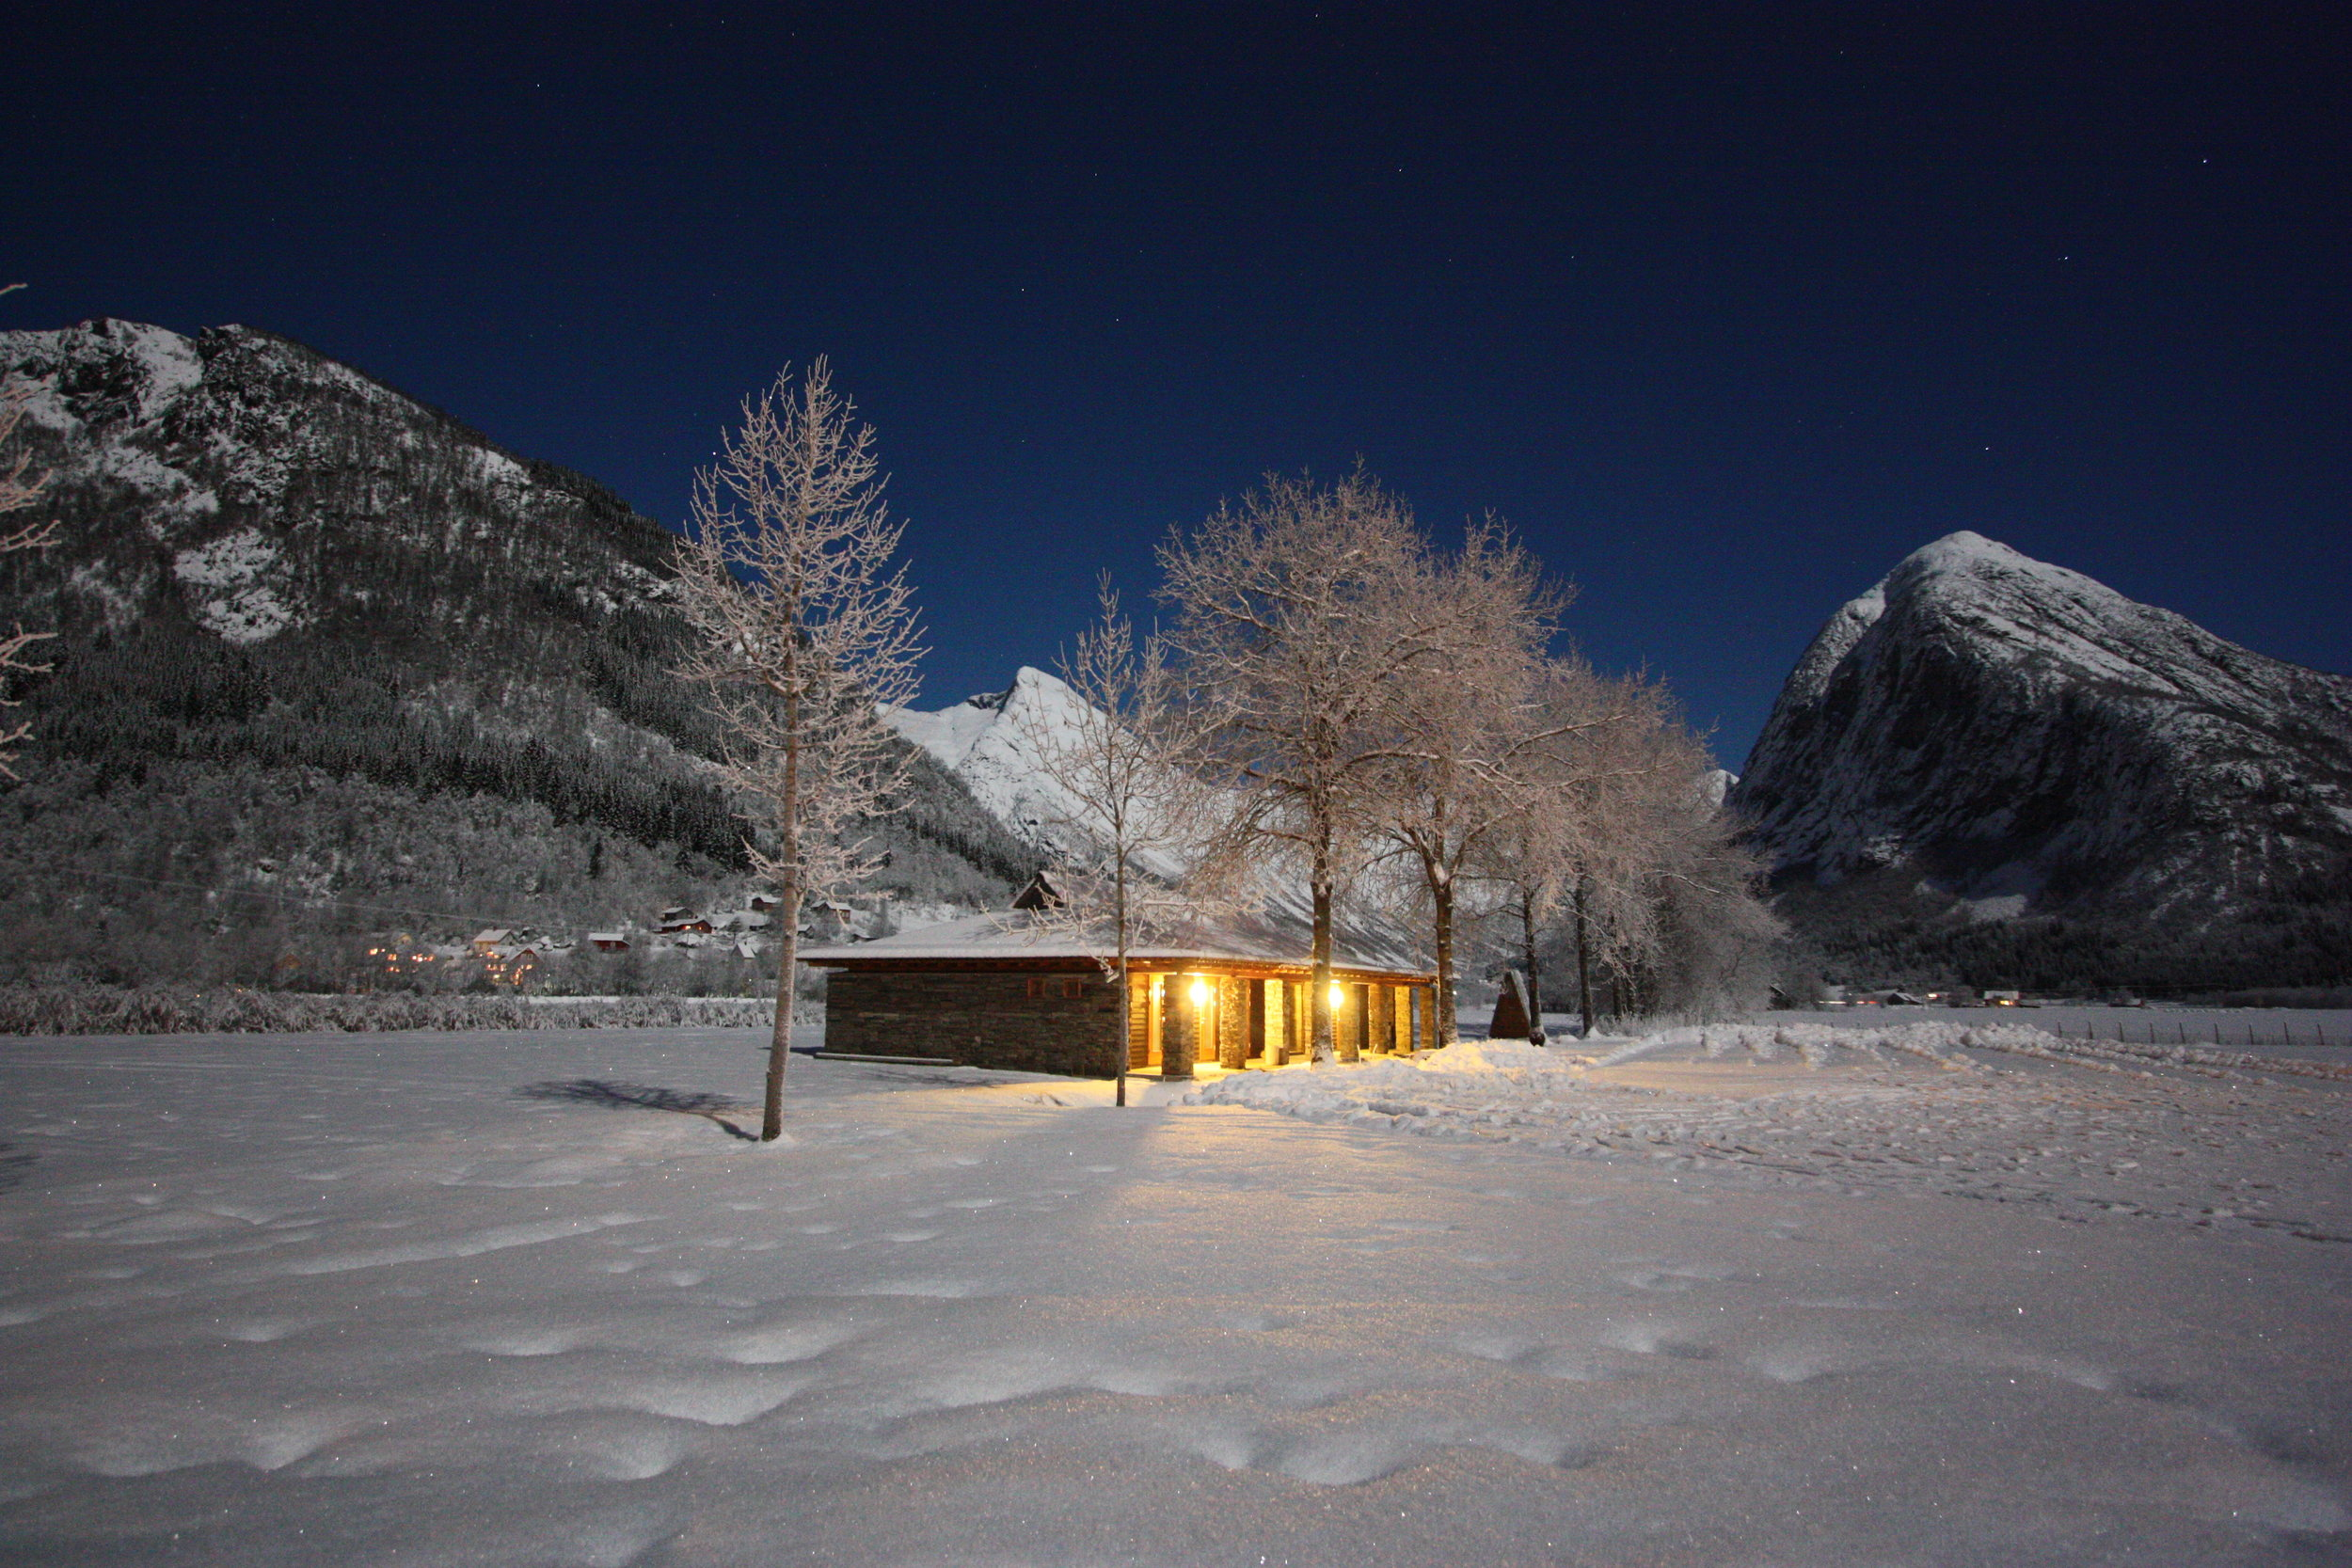 The Field Station in winter night. Photo: Gaute D. Bøyum.